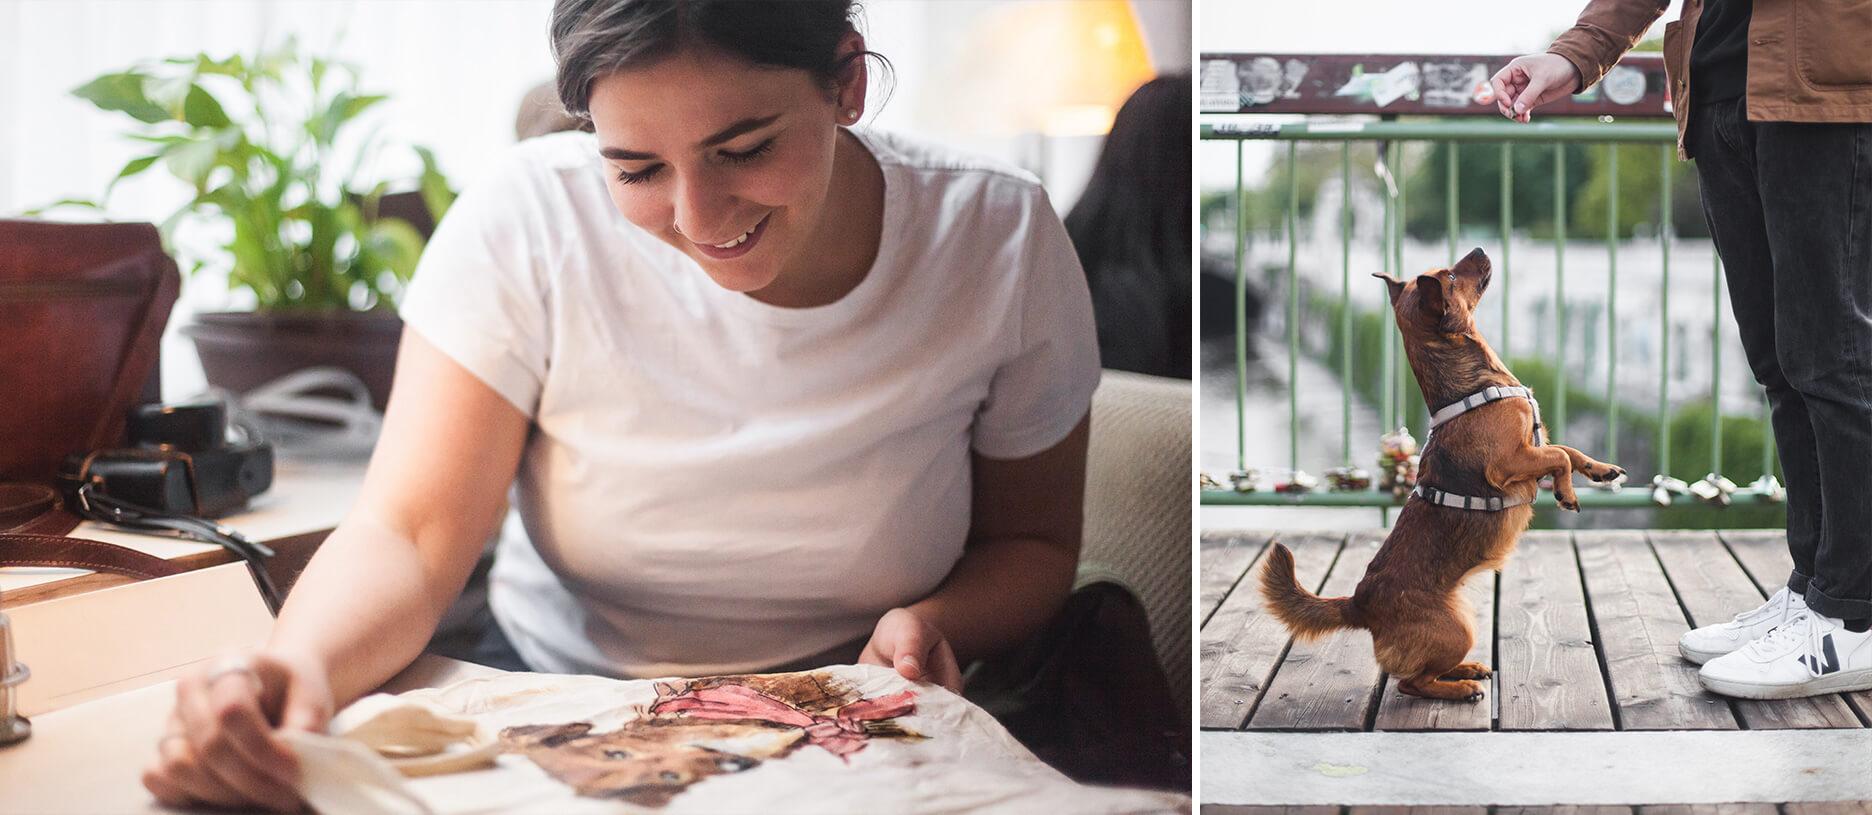 Die Stadthunde Maximilian Salzer Photograph Fotograf Sophie Nawratil Kunststudentin Rosie Rosierosebear adoptdontshop Portrait Jolly Schwarz Photography Alexandra Stalzer Grafikdesign Wien Hunde Stadt